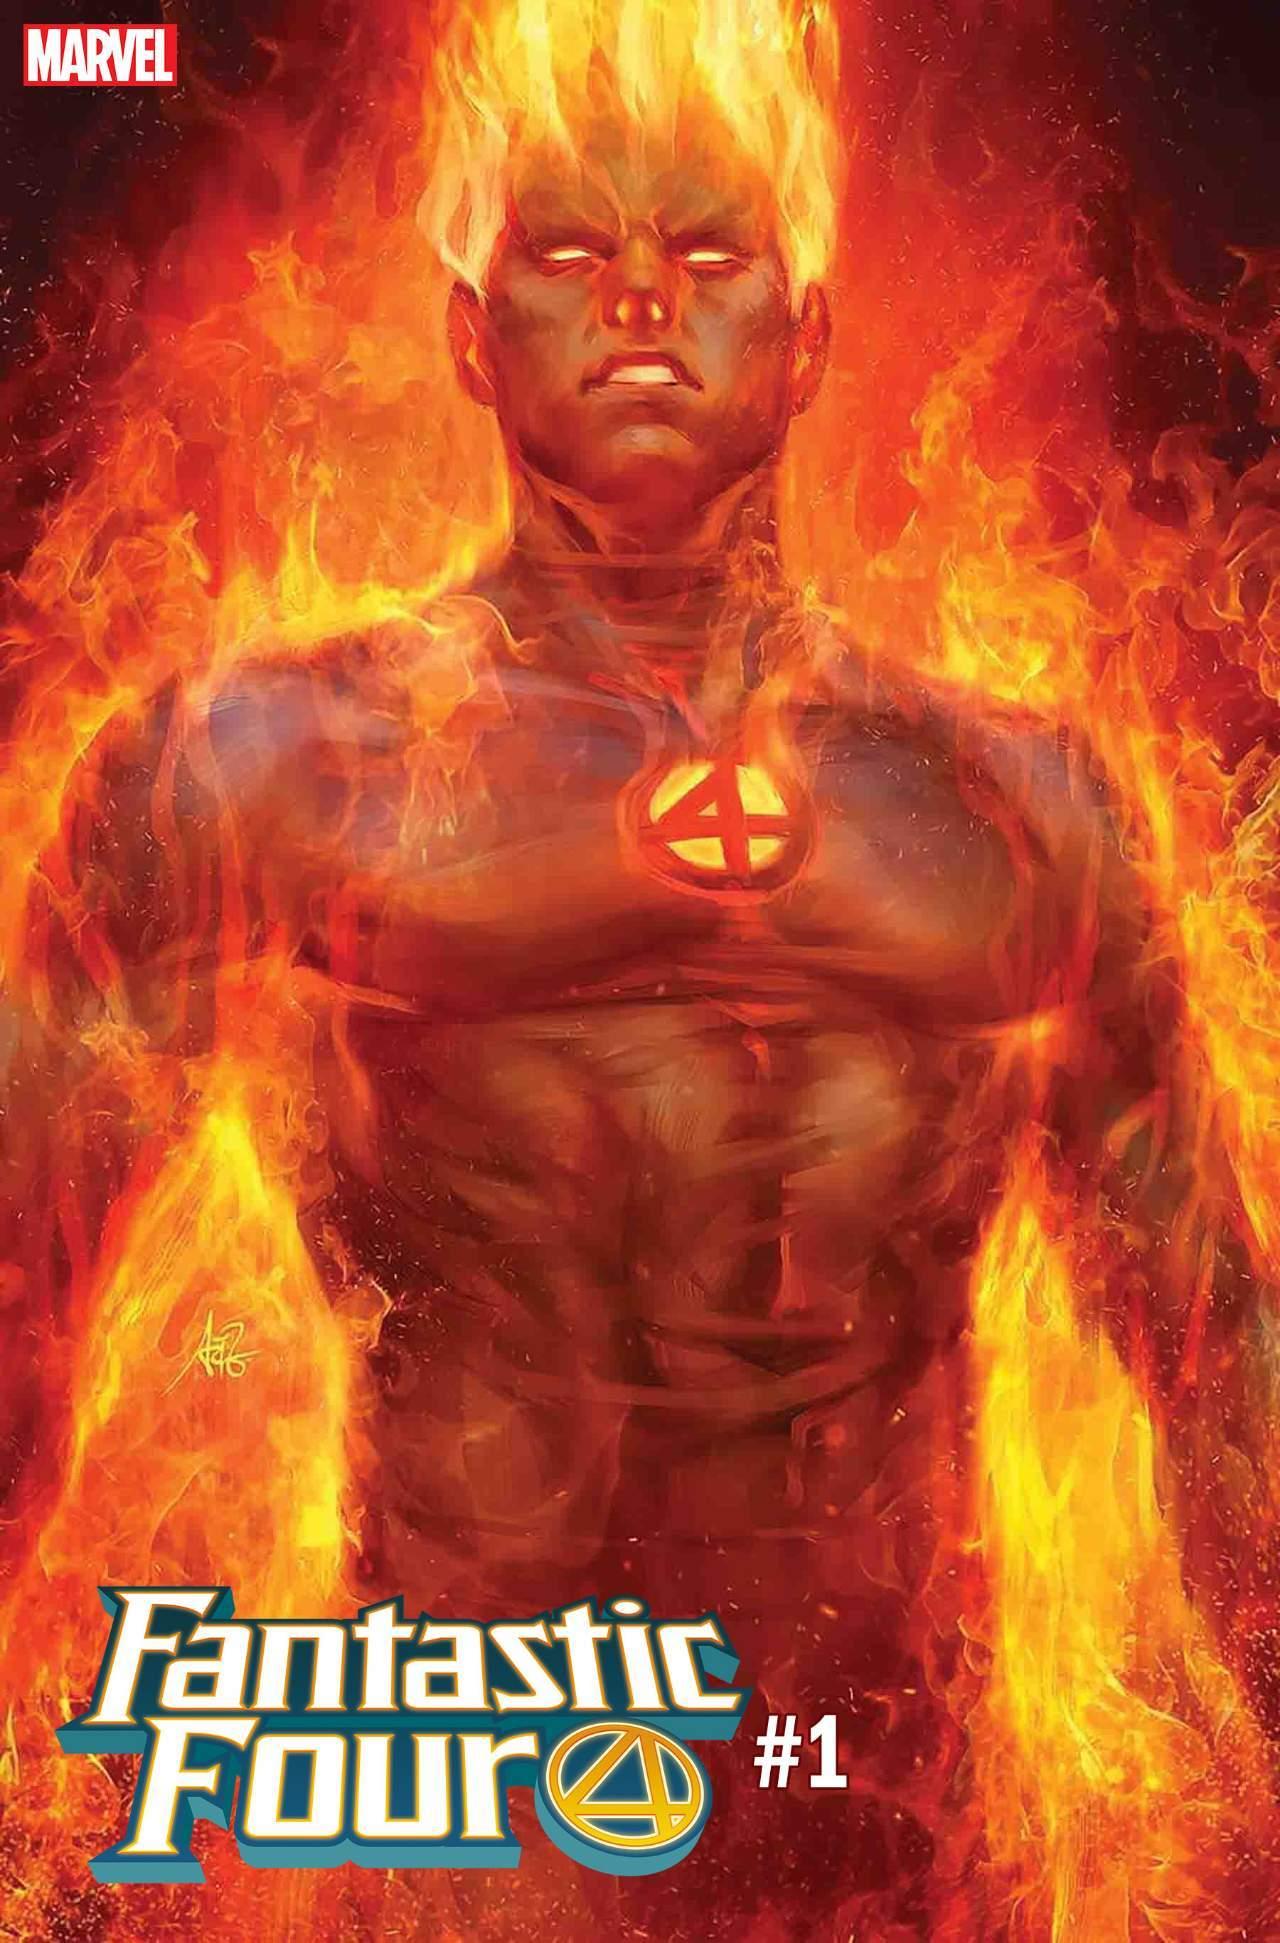 Fantastic-Four-1-Human-Torch-Artgerm